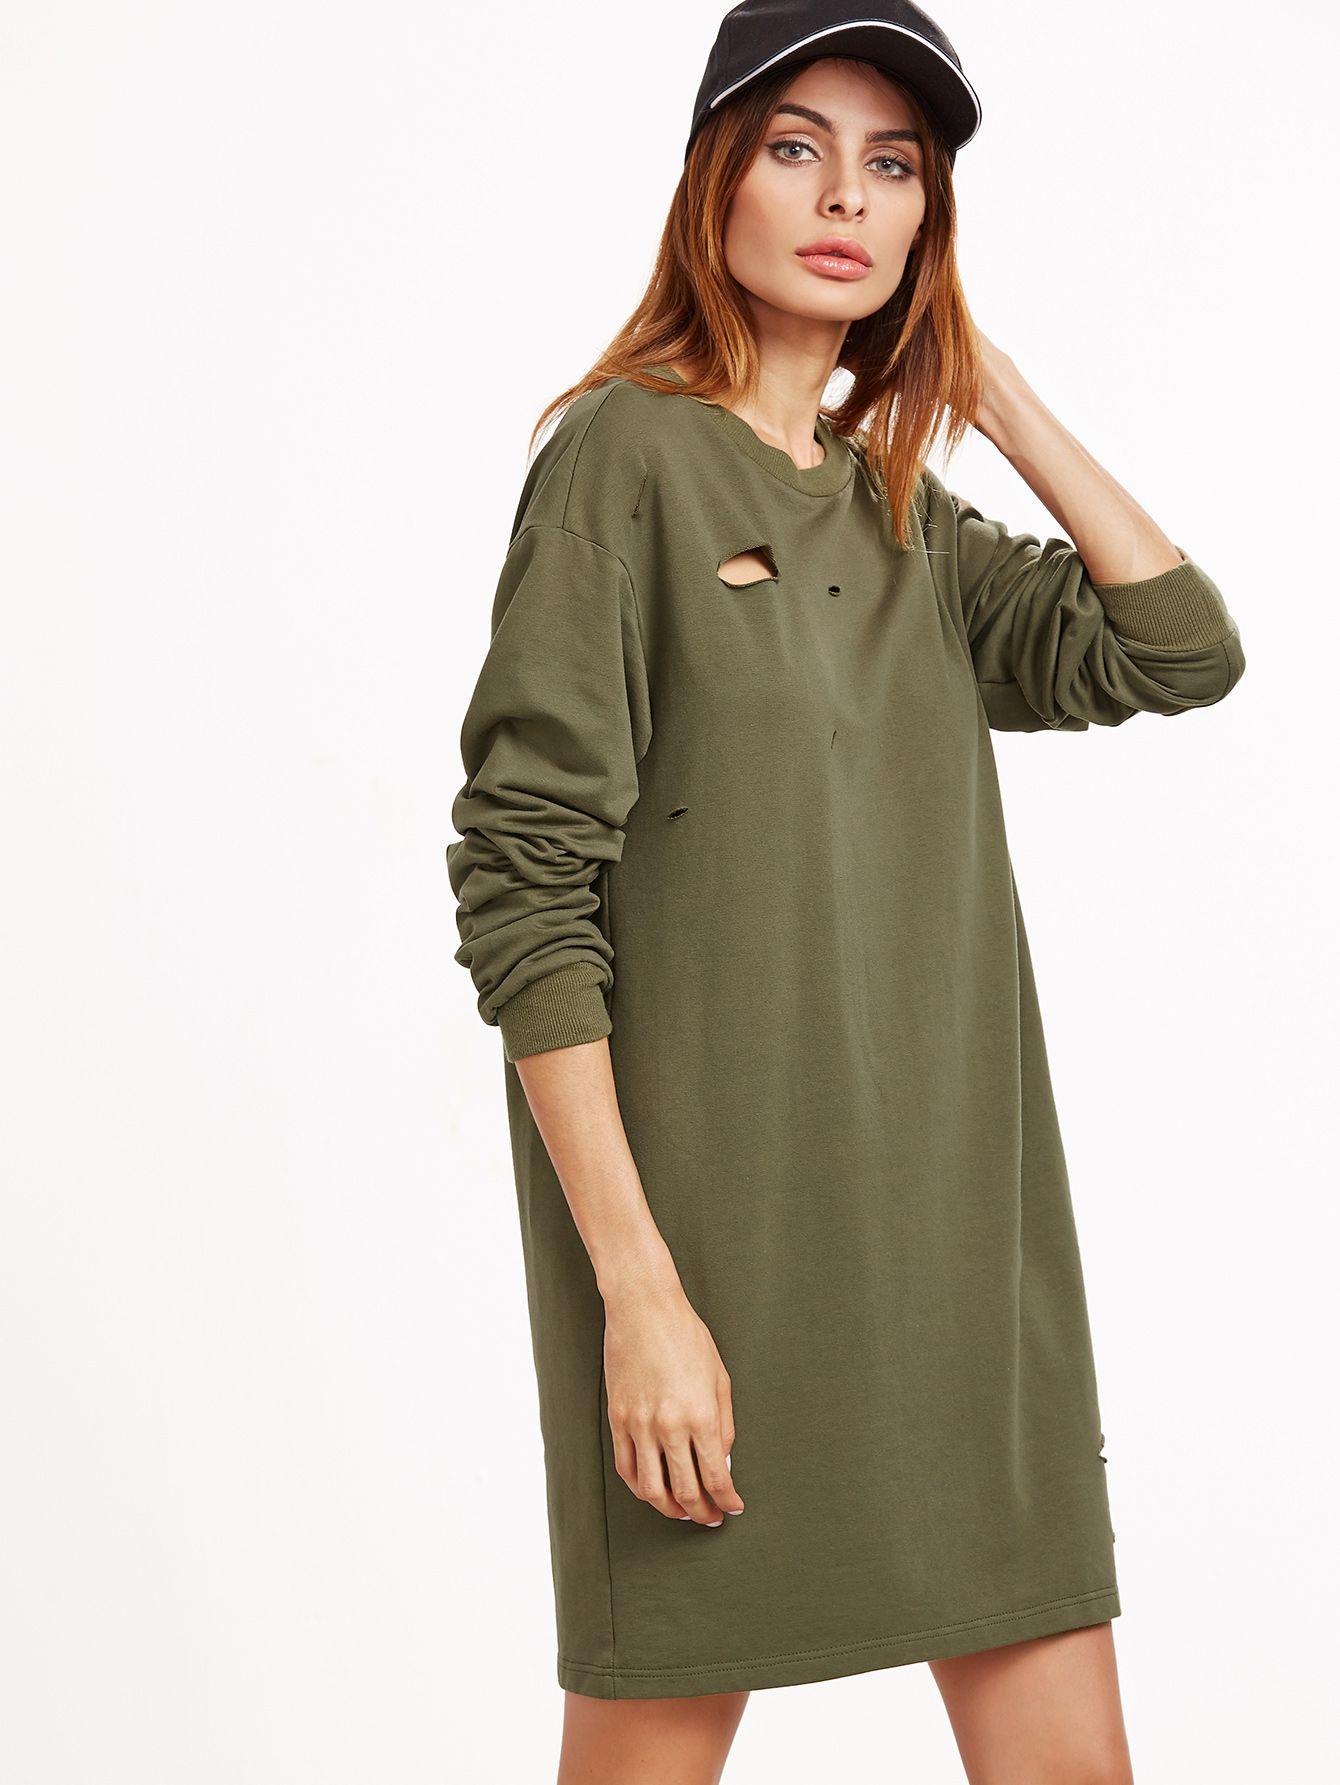 822040f23ee Модное платье-свитшот цвета хаки